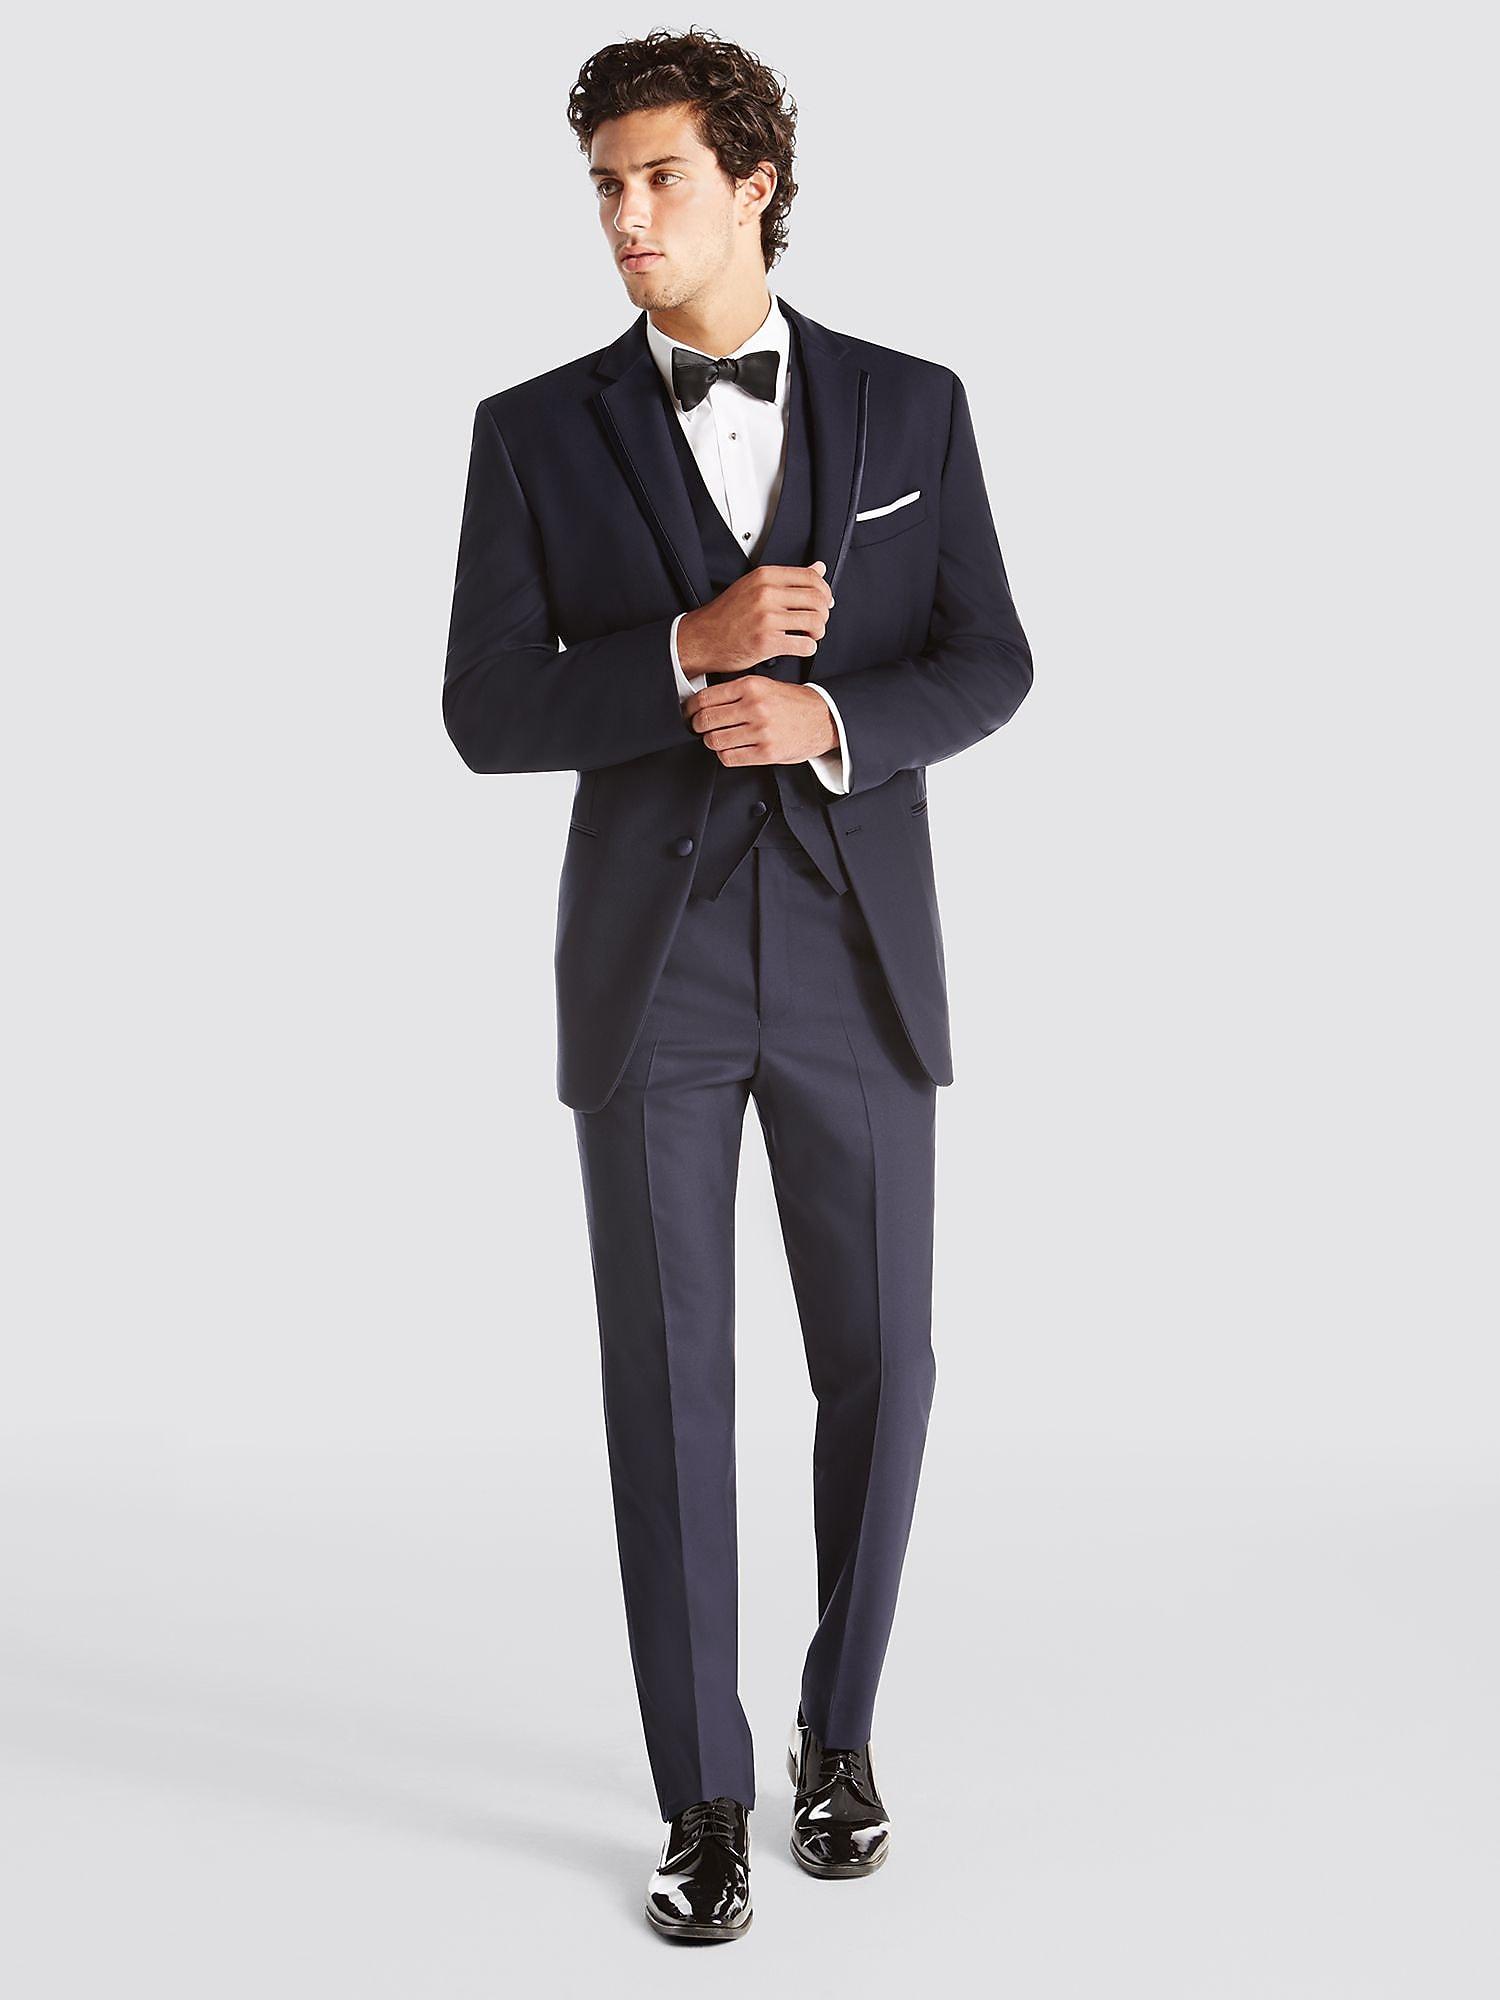 Black Tuxedo | BLACK by Vera Wang Tuxedo | Tuxedo Rental | Men's ...